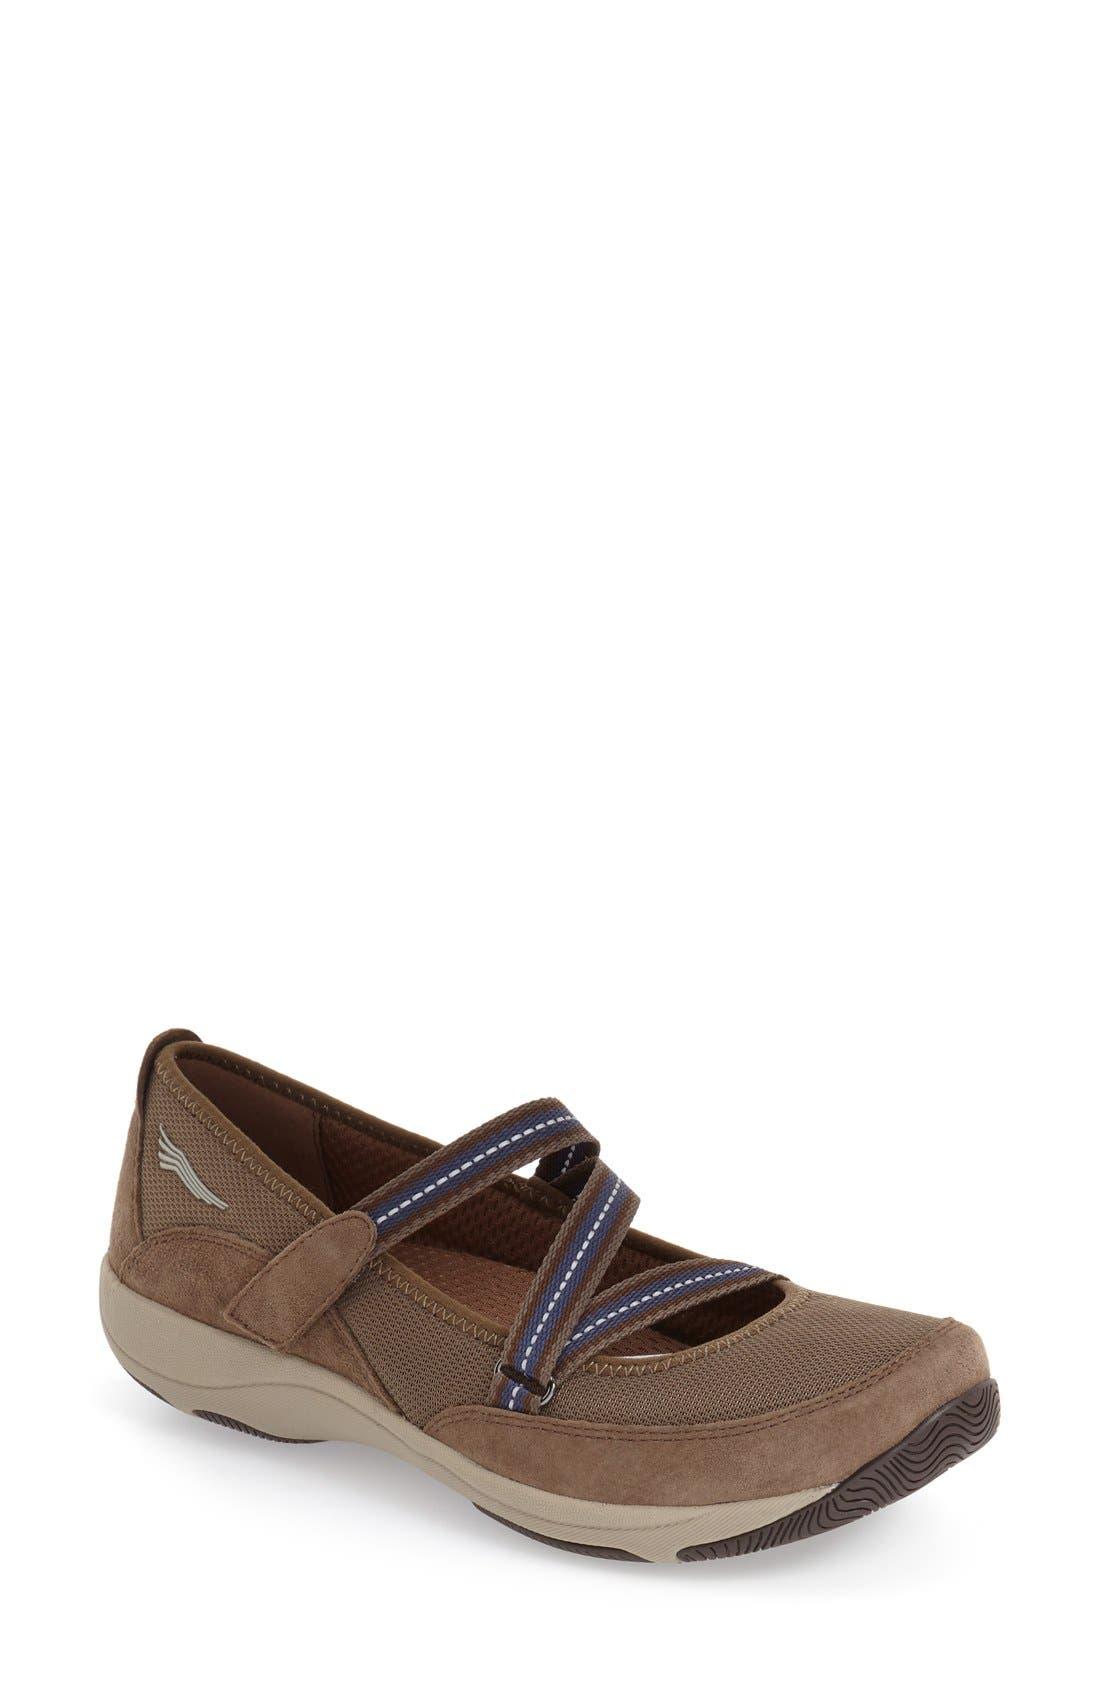 'Hazel' Slip-On Sneaker,                         Main,                         color, Taupe Suede